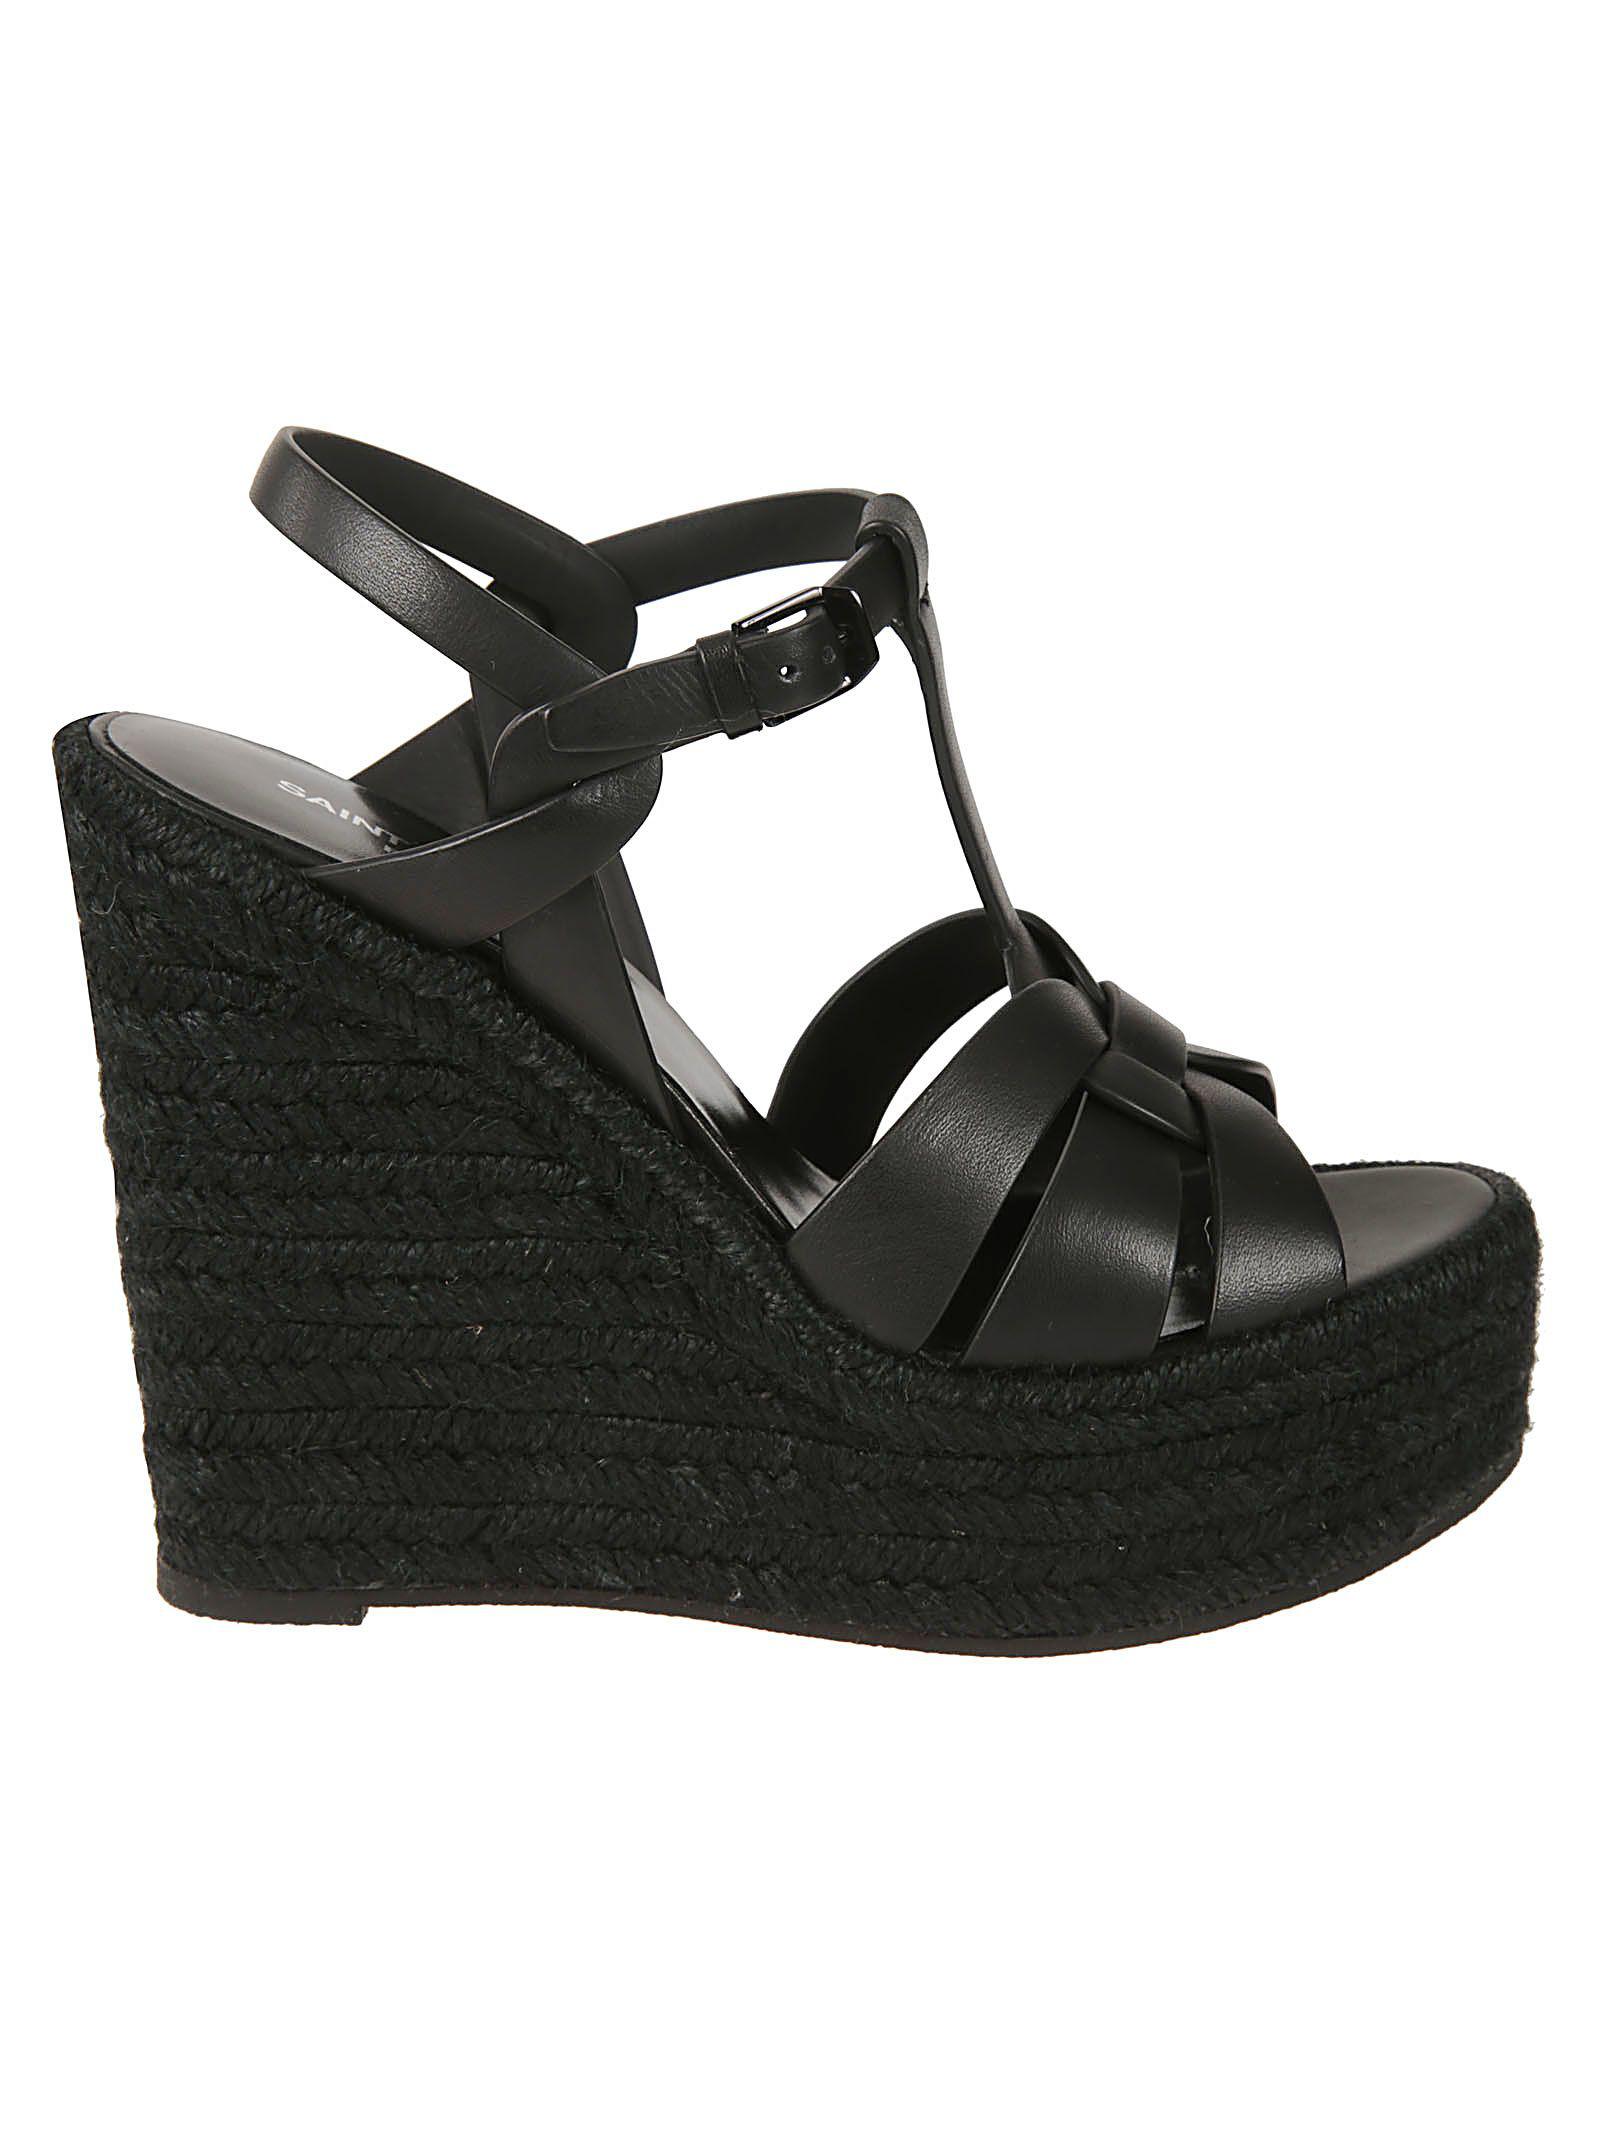 27405de6245 Saint Laurent Tribute Leather Platform Espadrille Wedge Sandal In Black